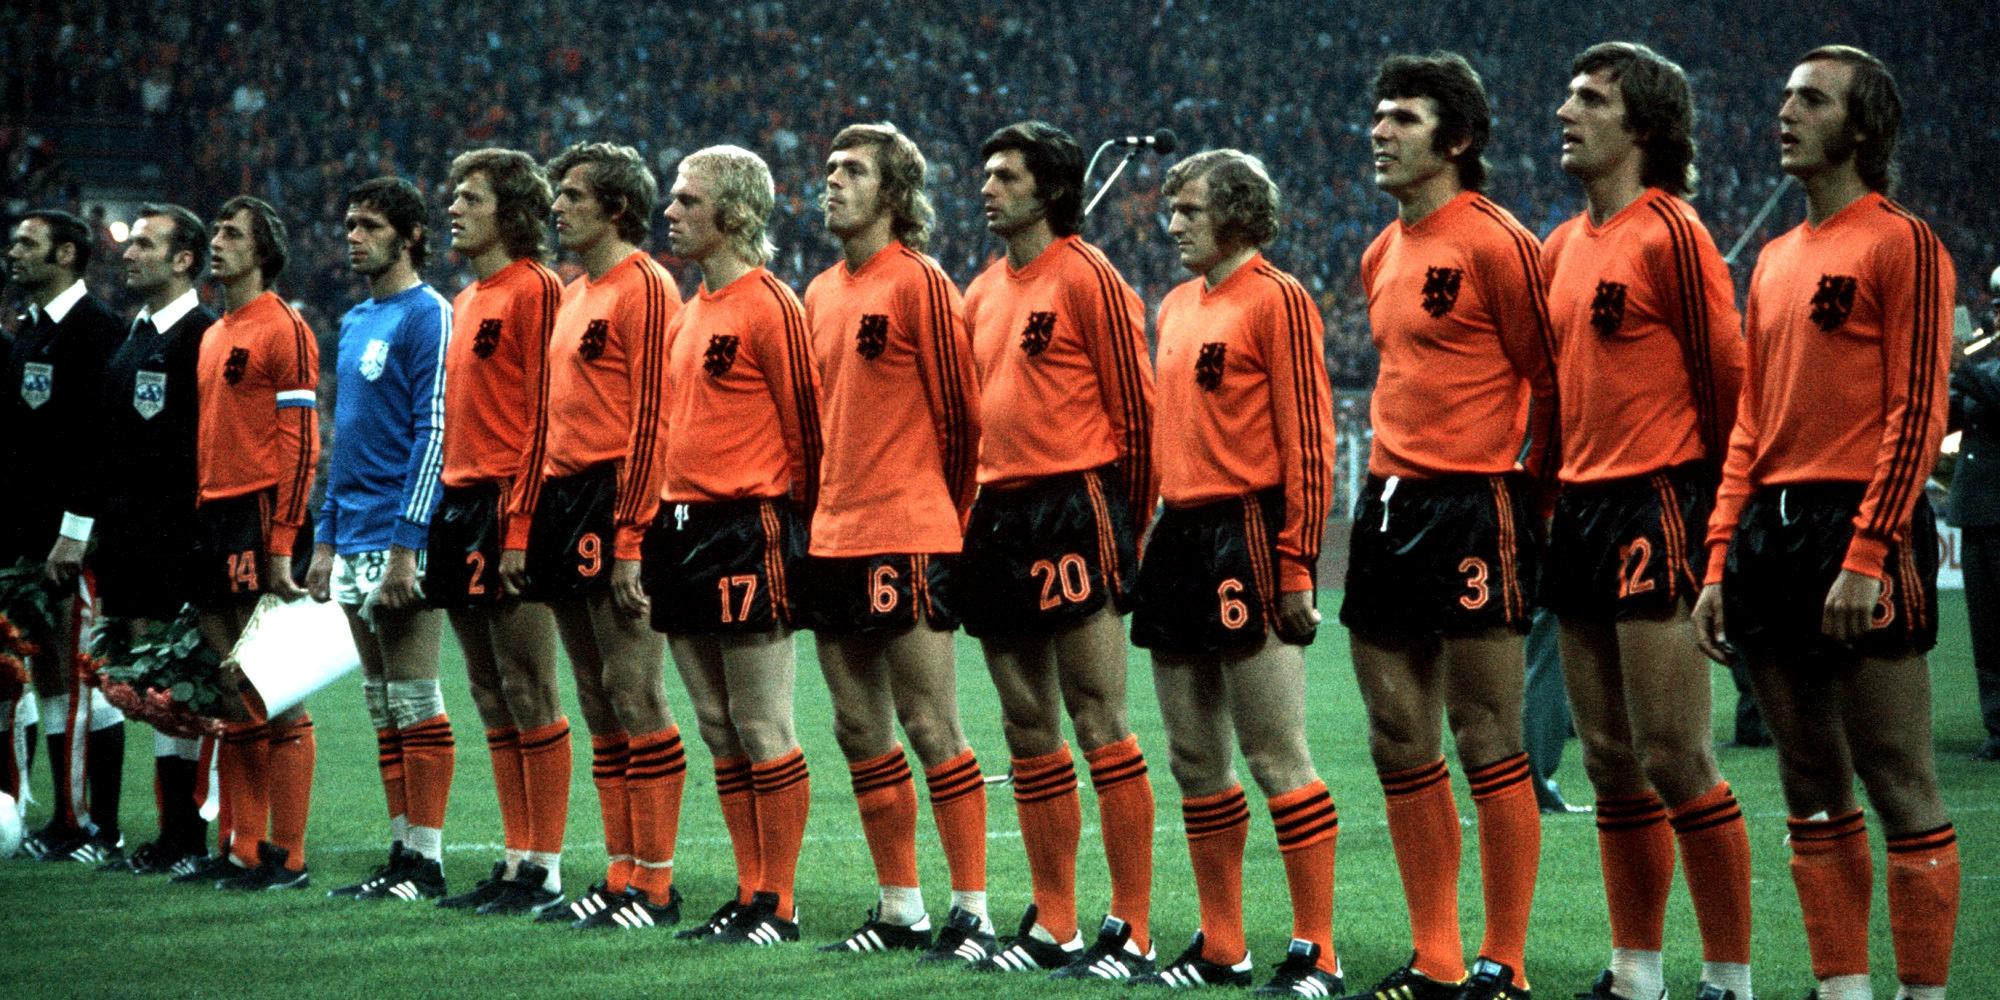 maillot-football-adidas-johann-cruyff-deux-bandes-1974-avril-2019-footpack